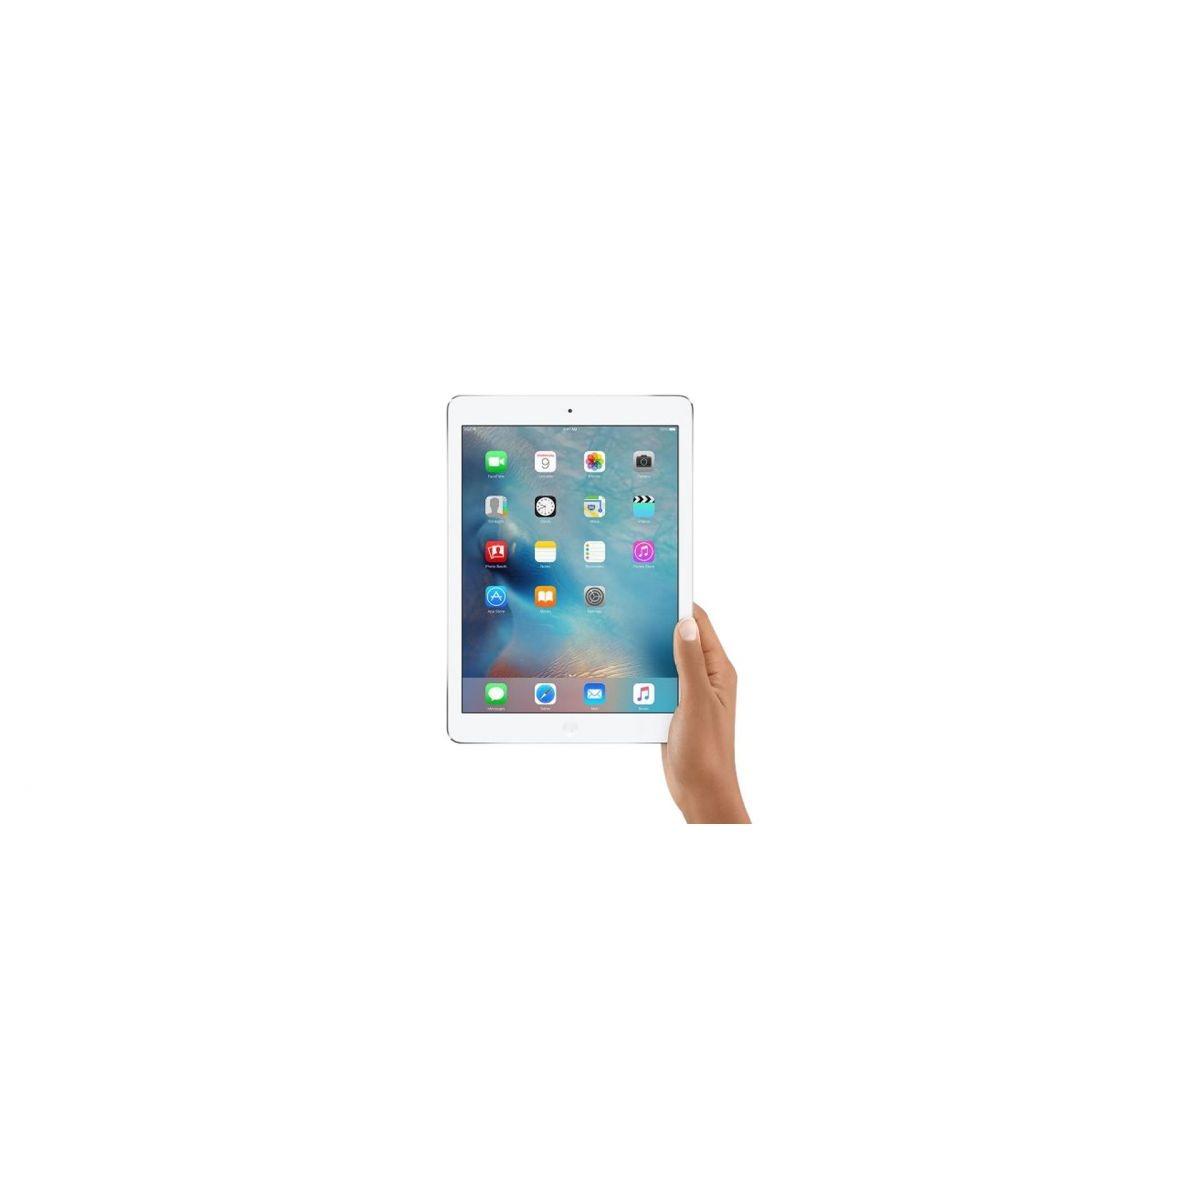 apple ipad air 16gb tela retina 9 7 wifi 4g silver. Black Bedroom Furniture Sets. Home Design Ideas